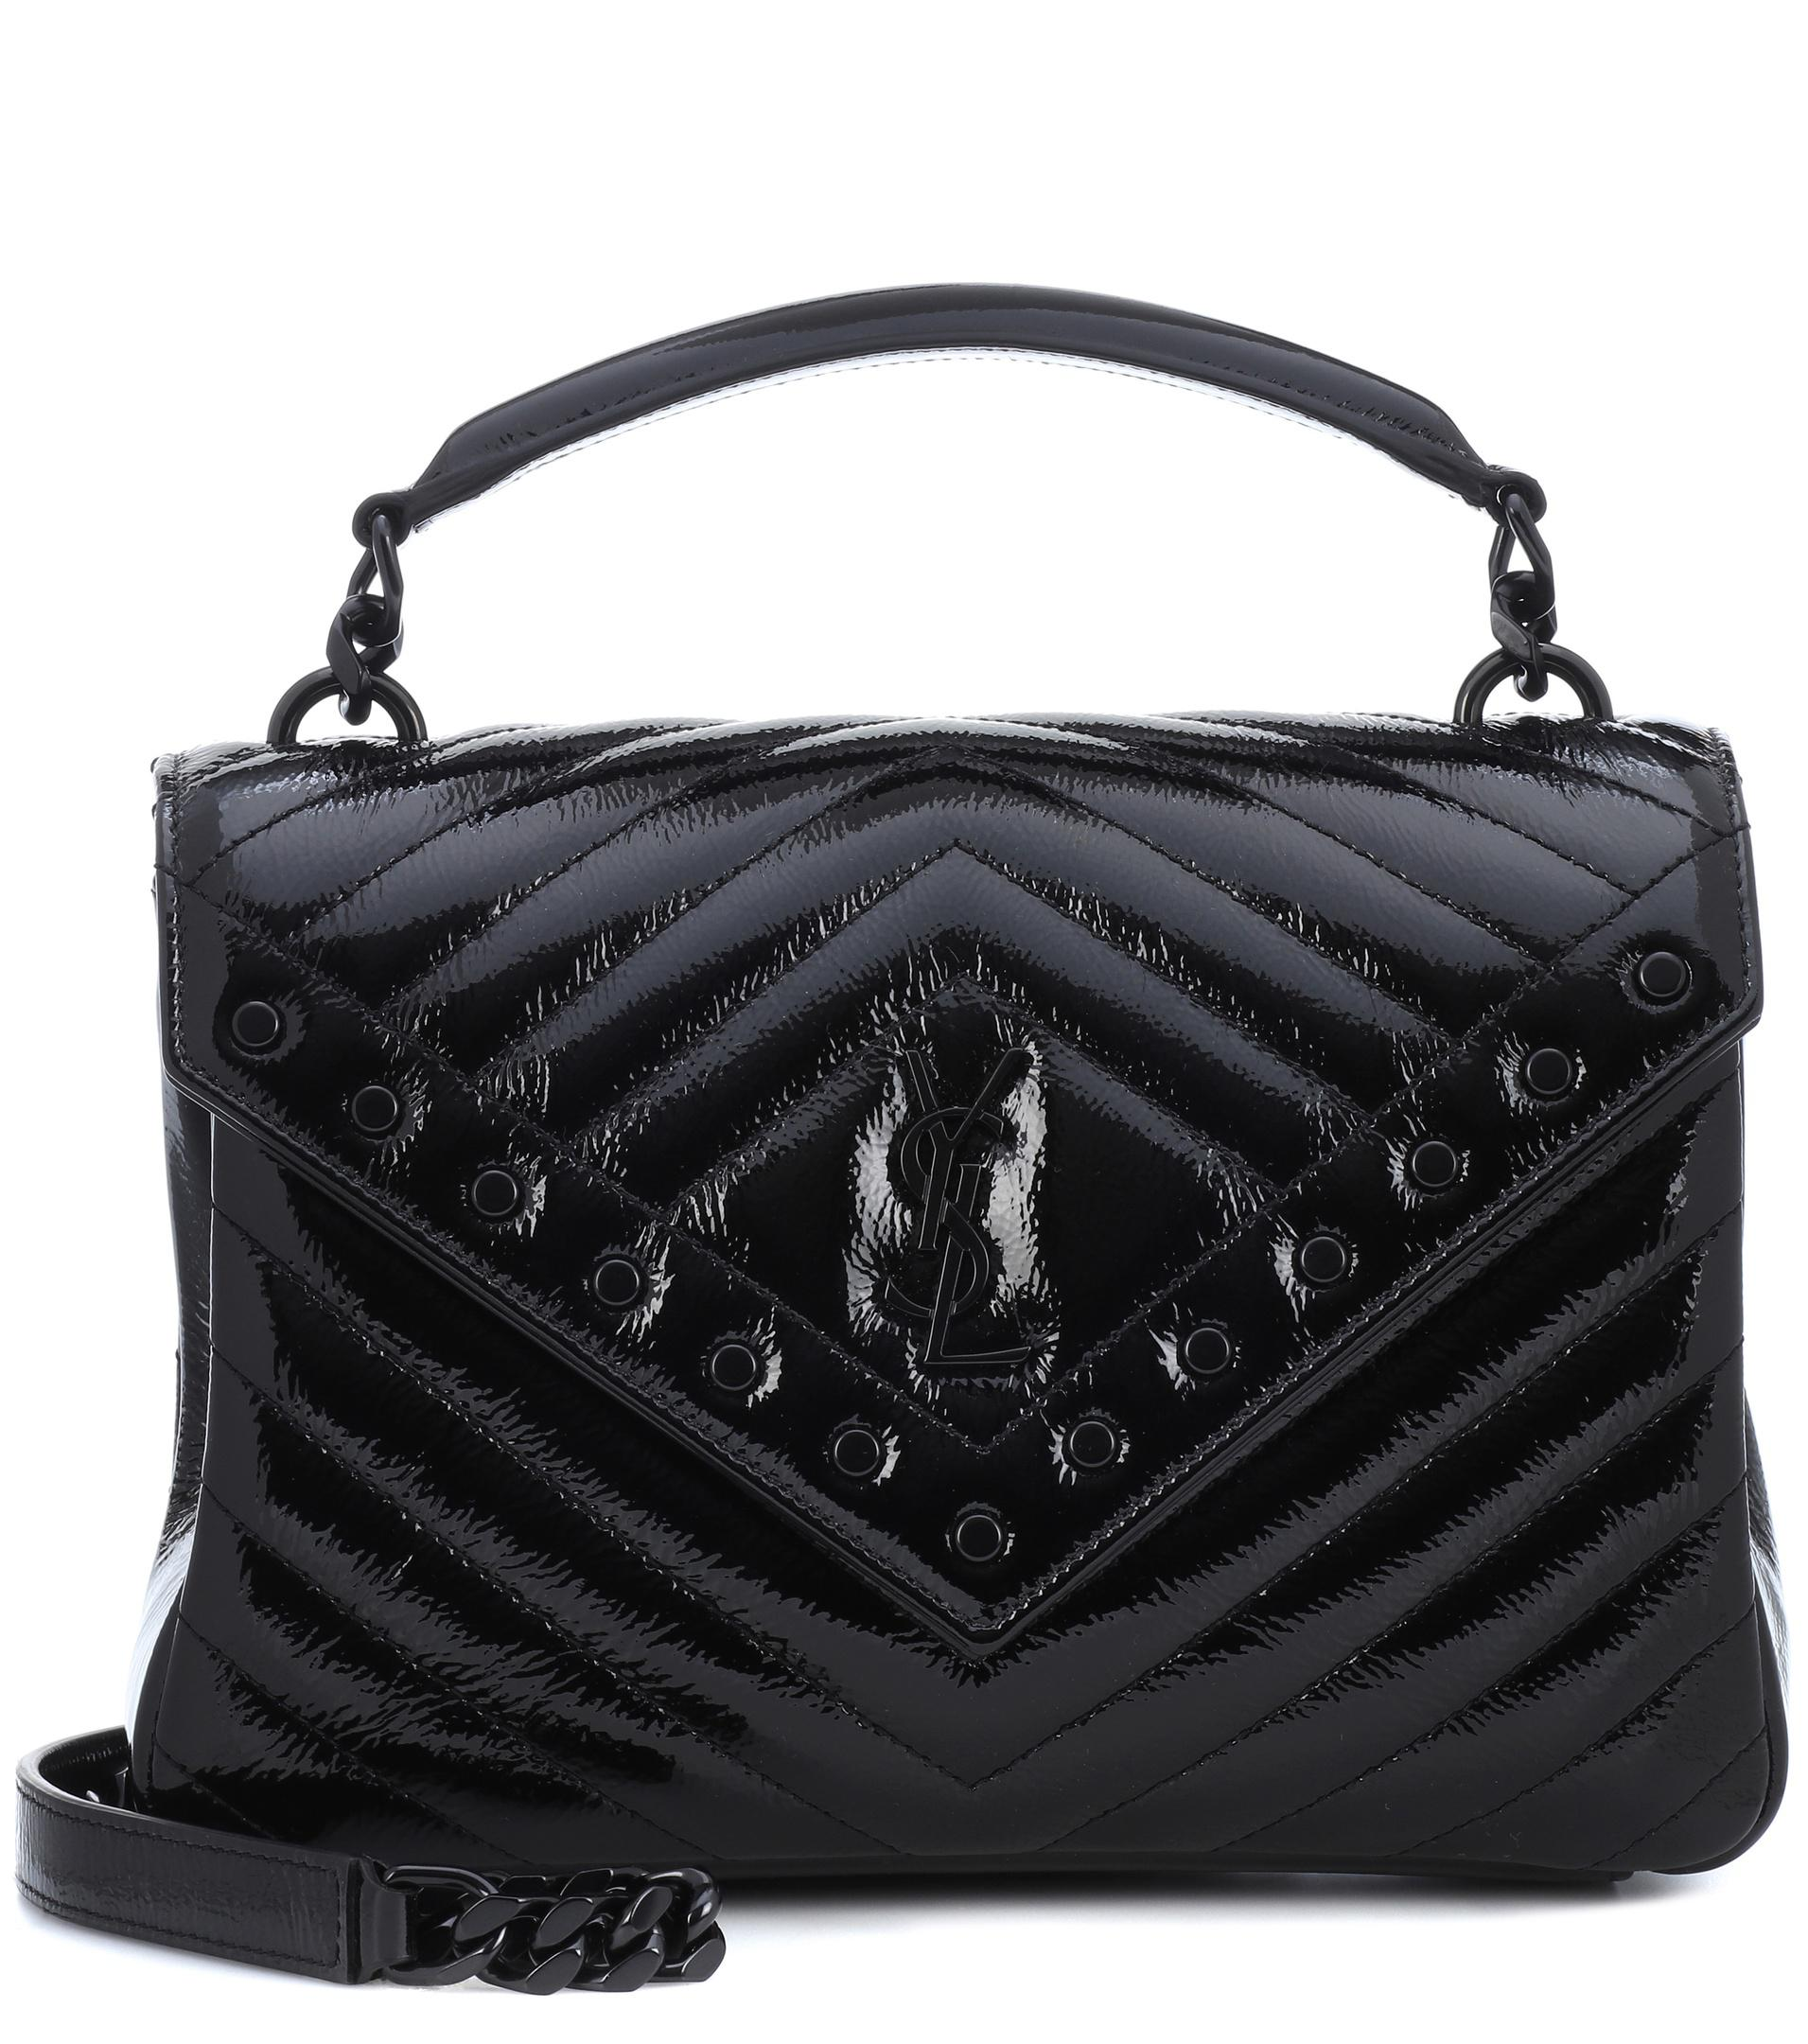 21eede3b976 Lyst - Saint Laurent Medium Collège Monogram Leather Shoulder Bag in ...